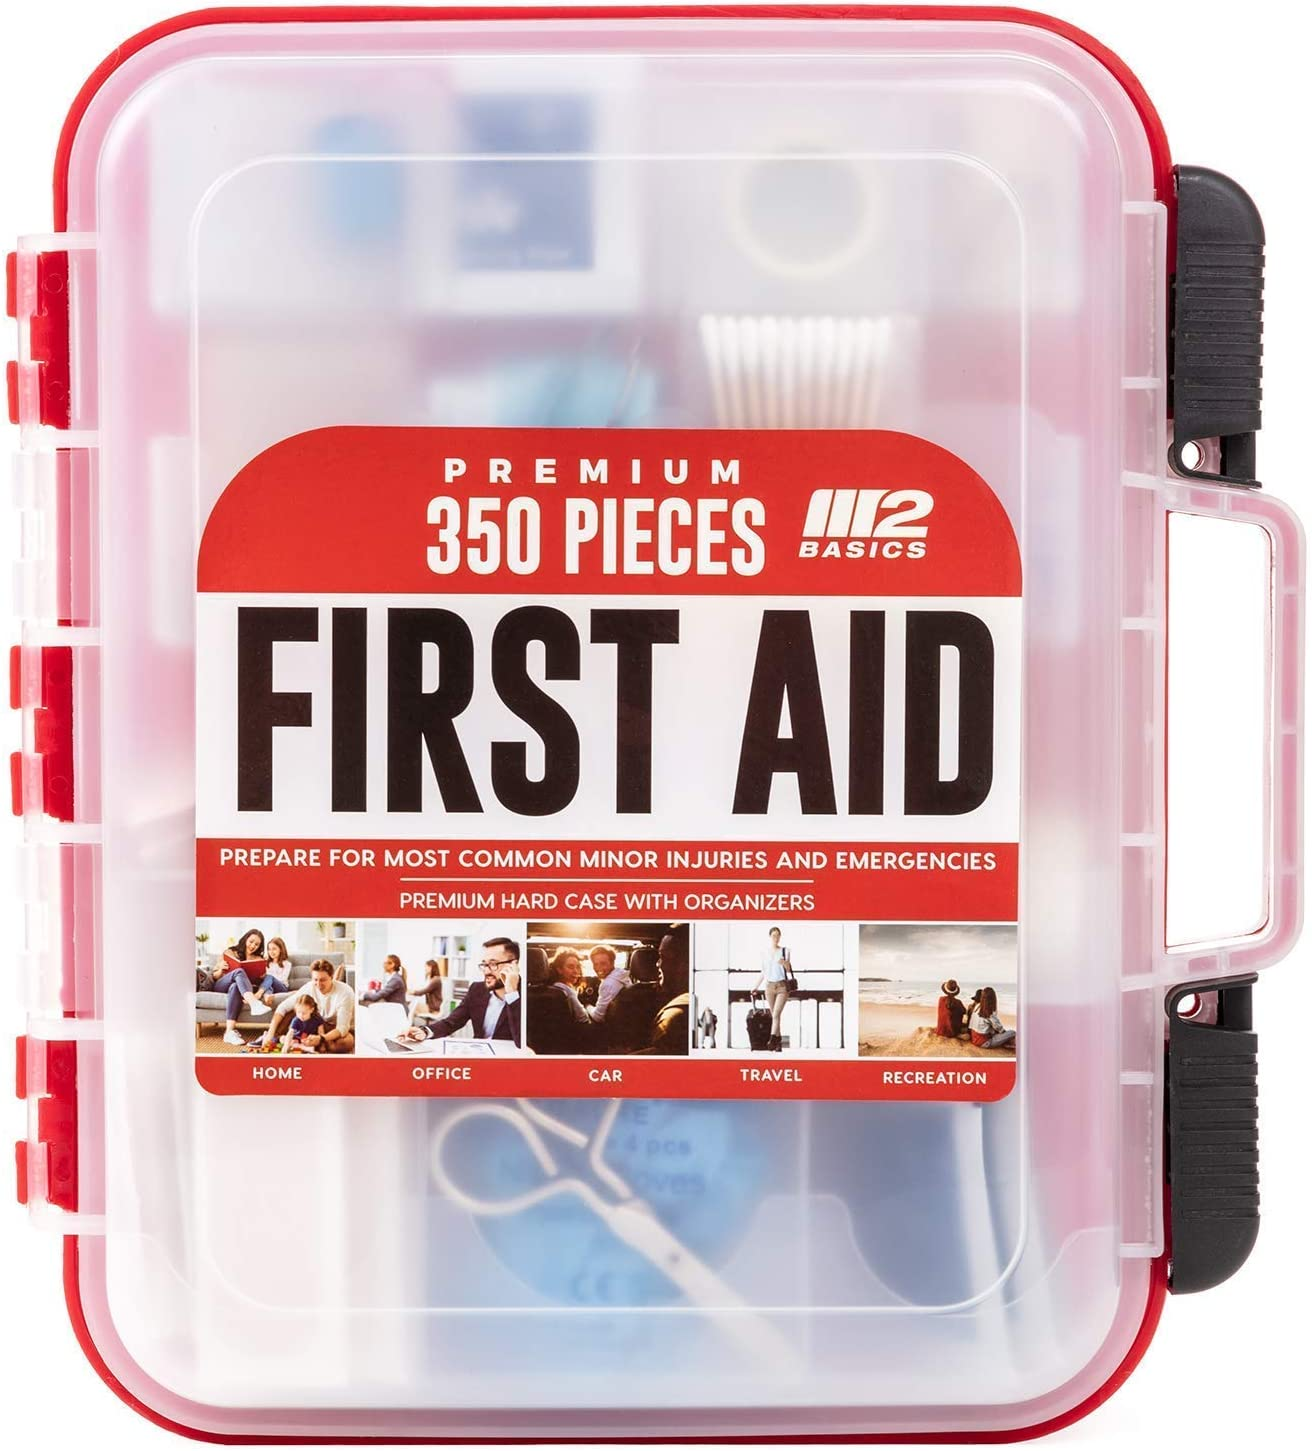 M2 BASICS 350 Piece Emergency First Aid Kit